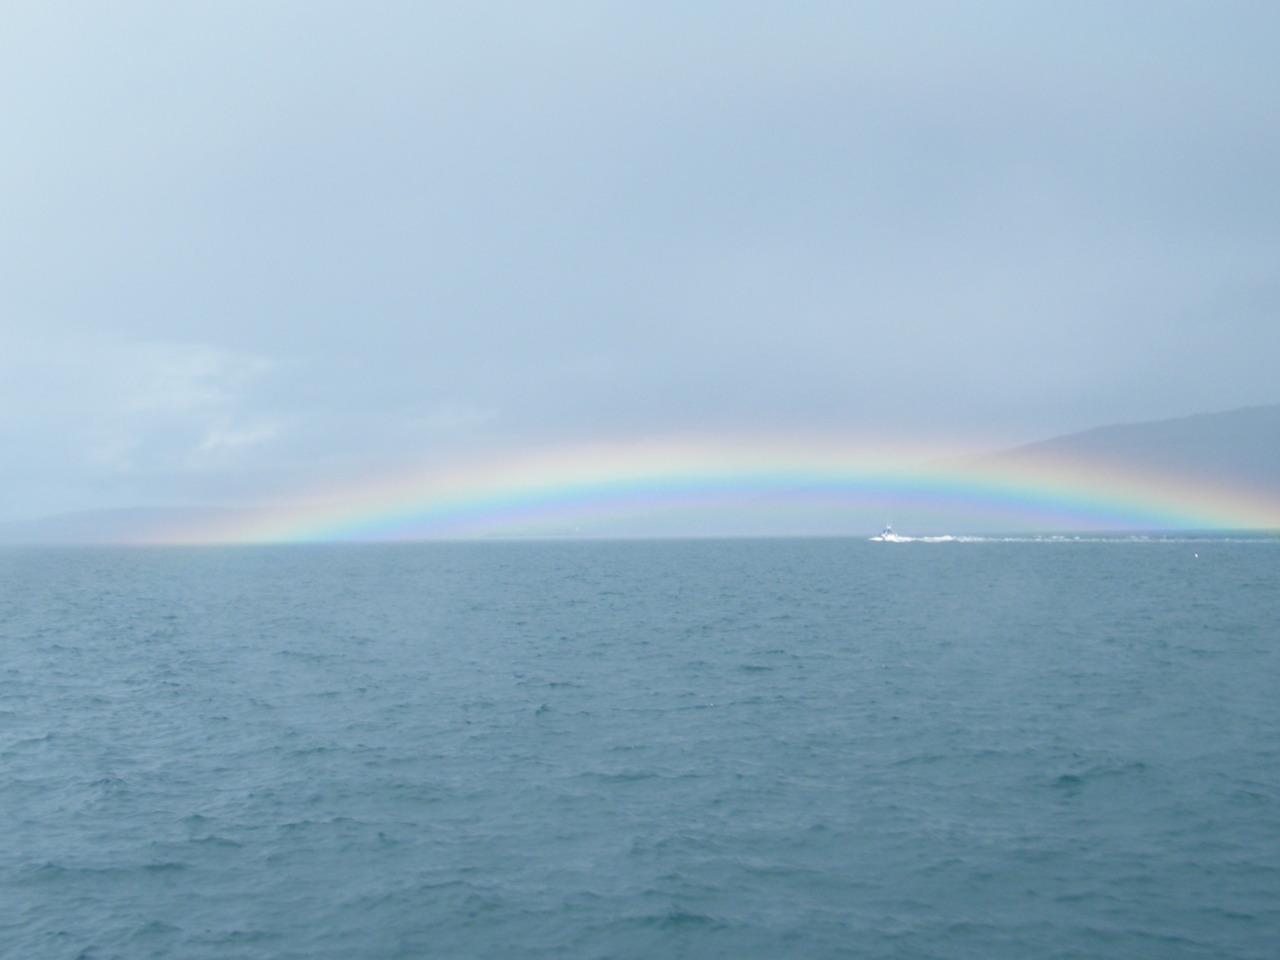 Rainbow over 'Power of Scotland'